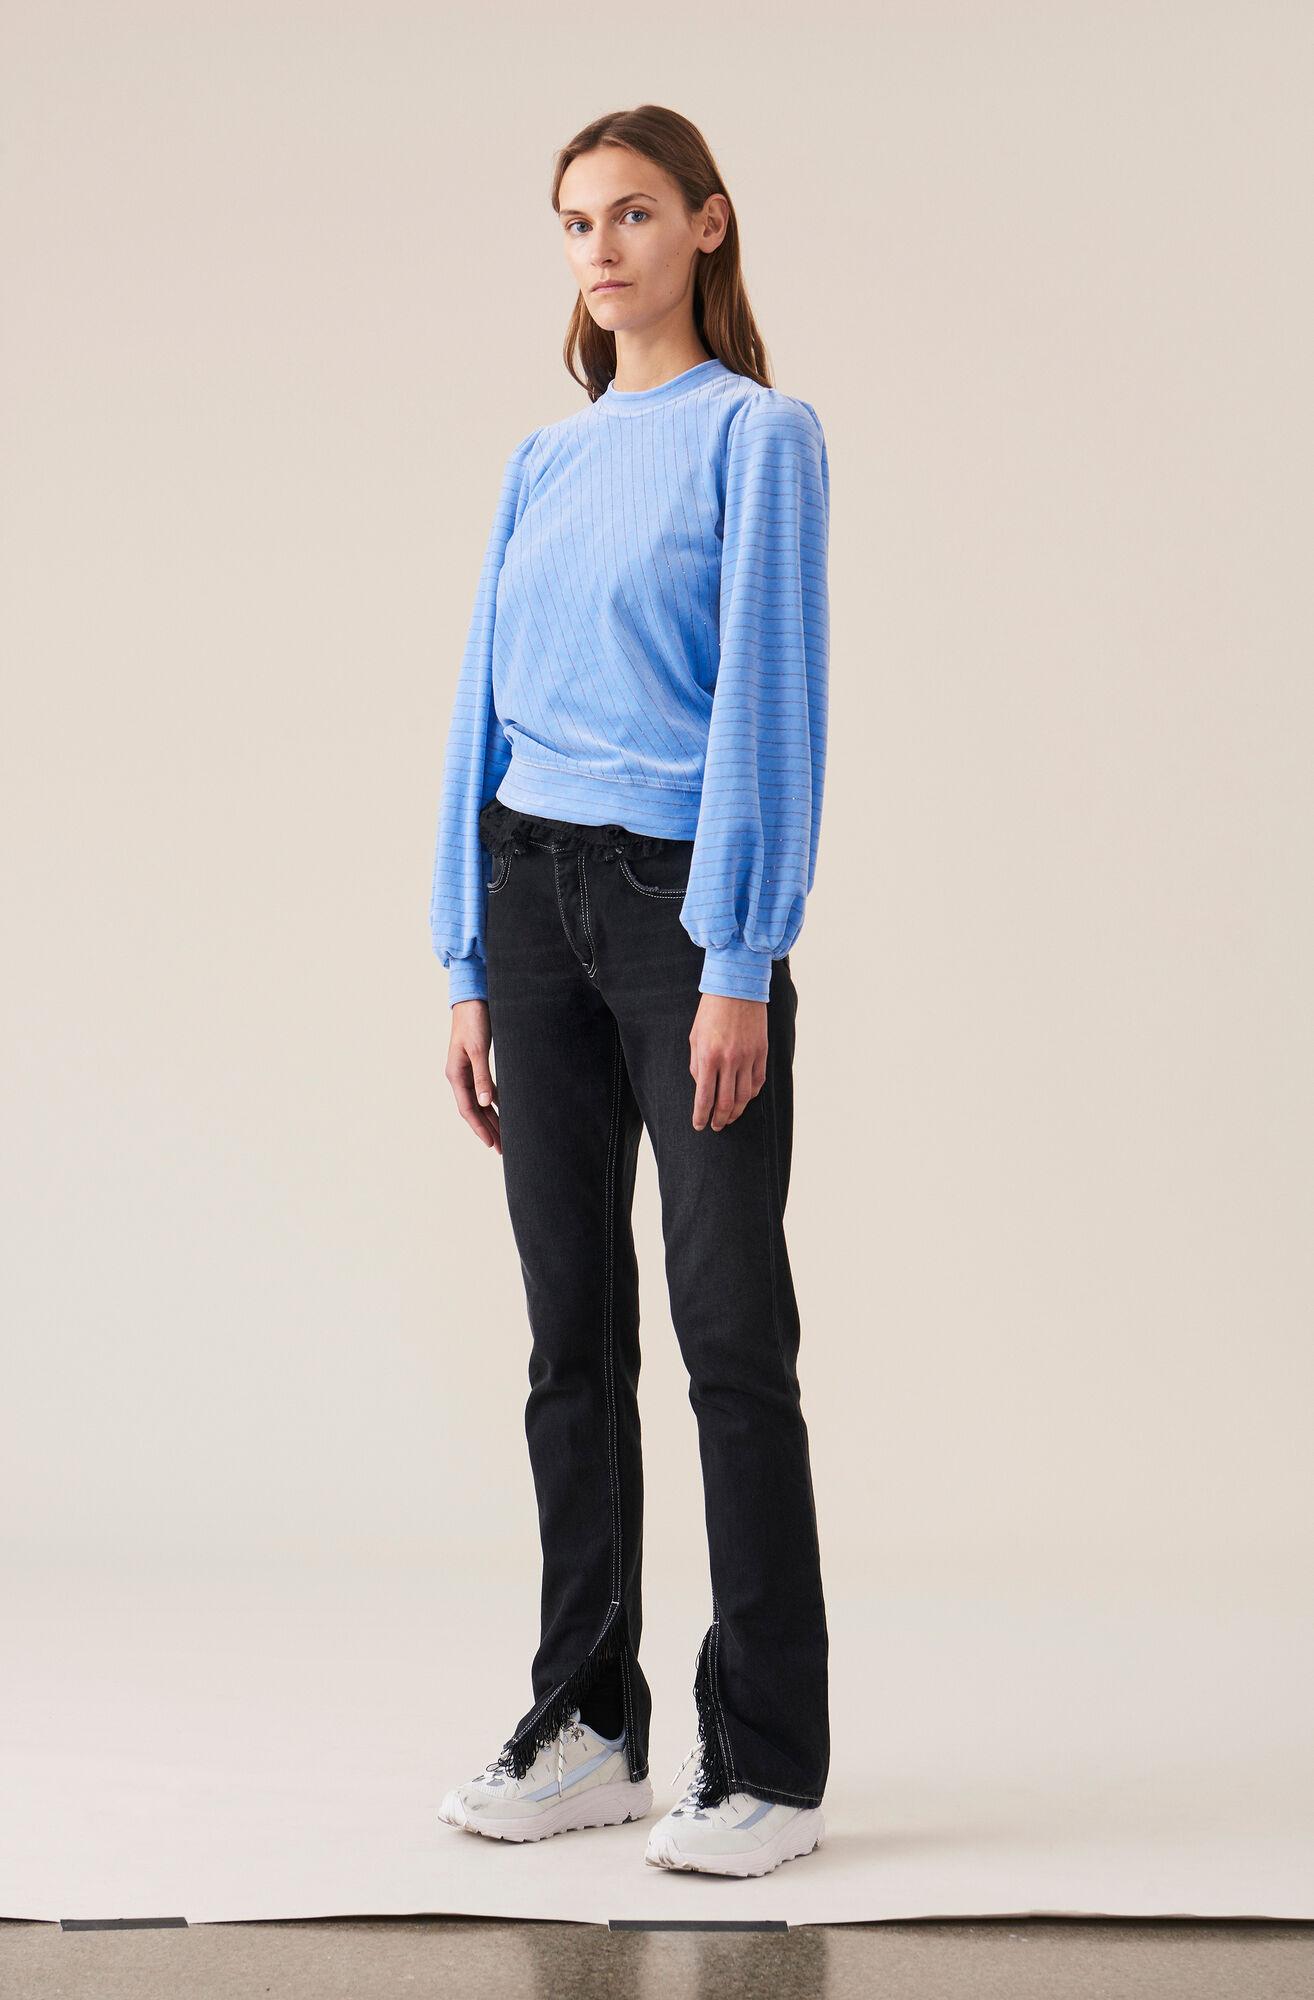 Velvet Jersey Puff Sweatshirt, Serenity Blue, hi-res